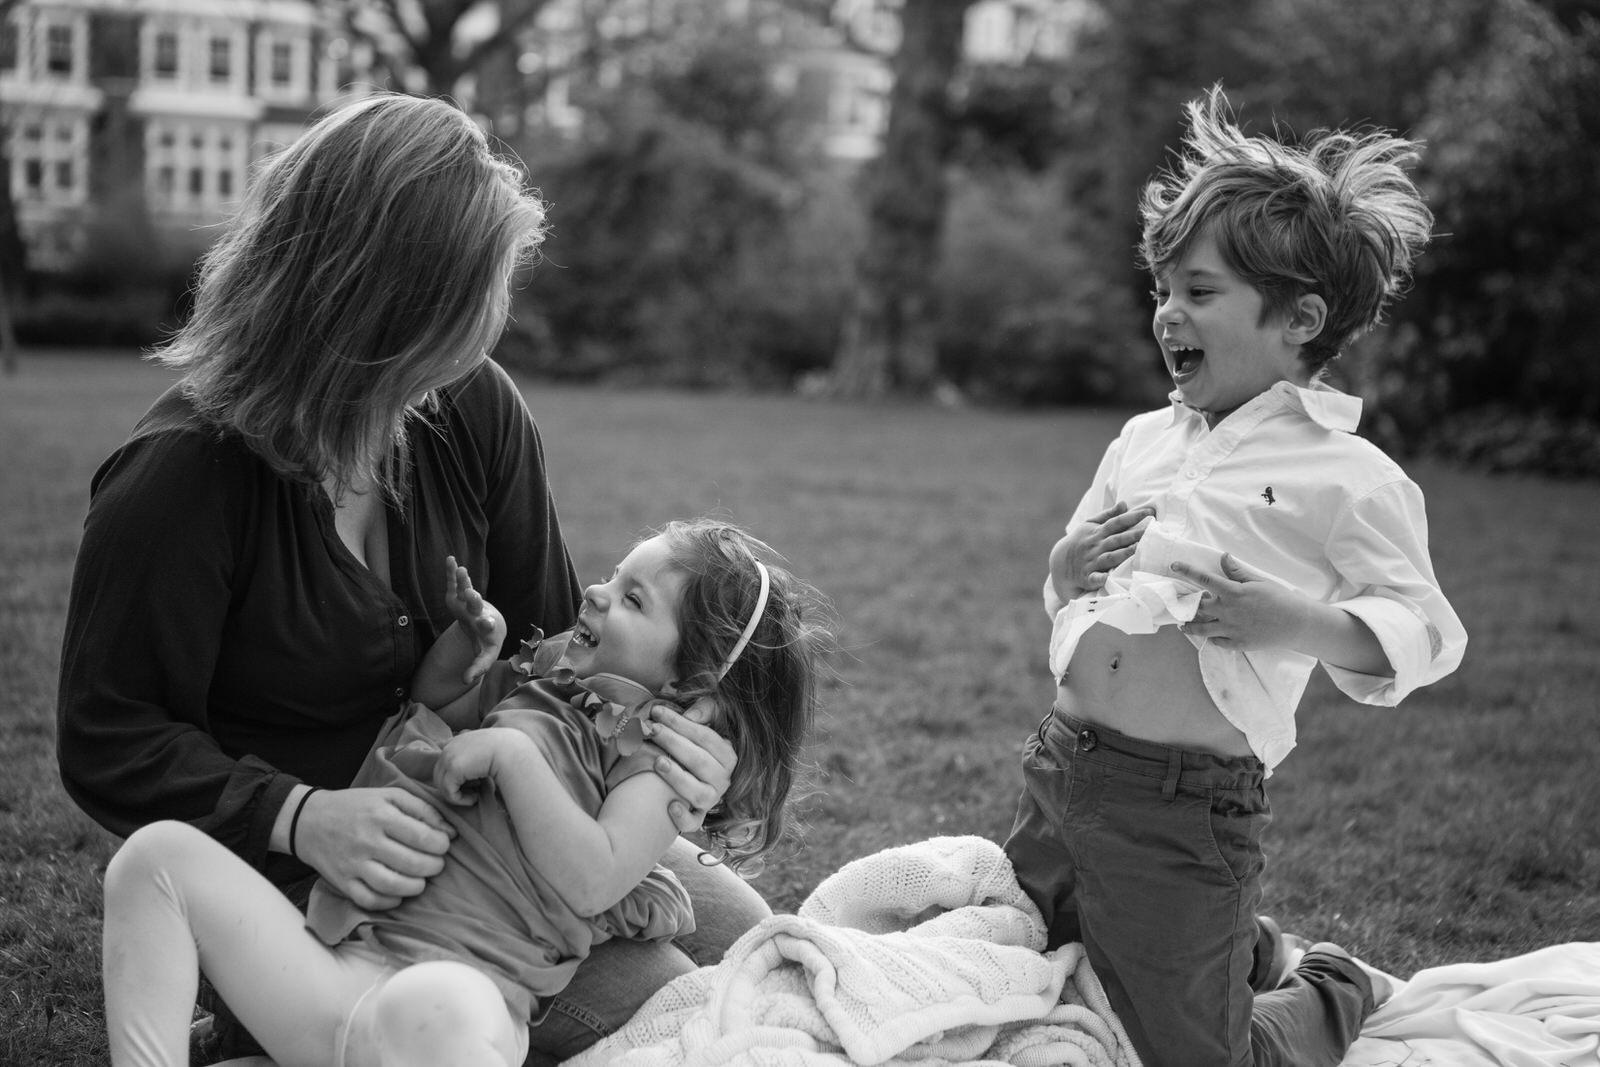 kensington-day-in-the-life-documentary-family-photographs-0172